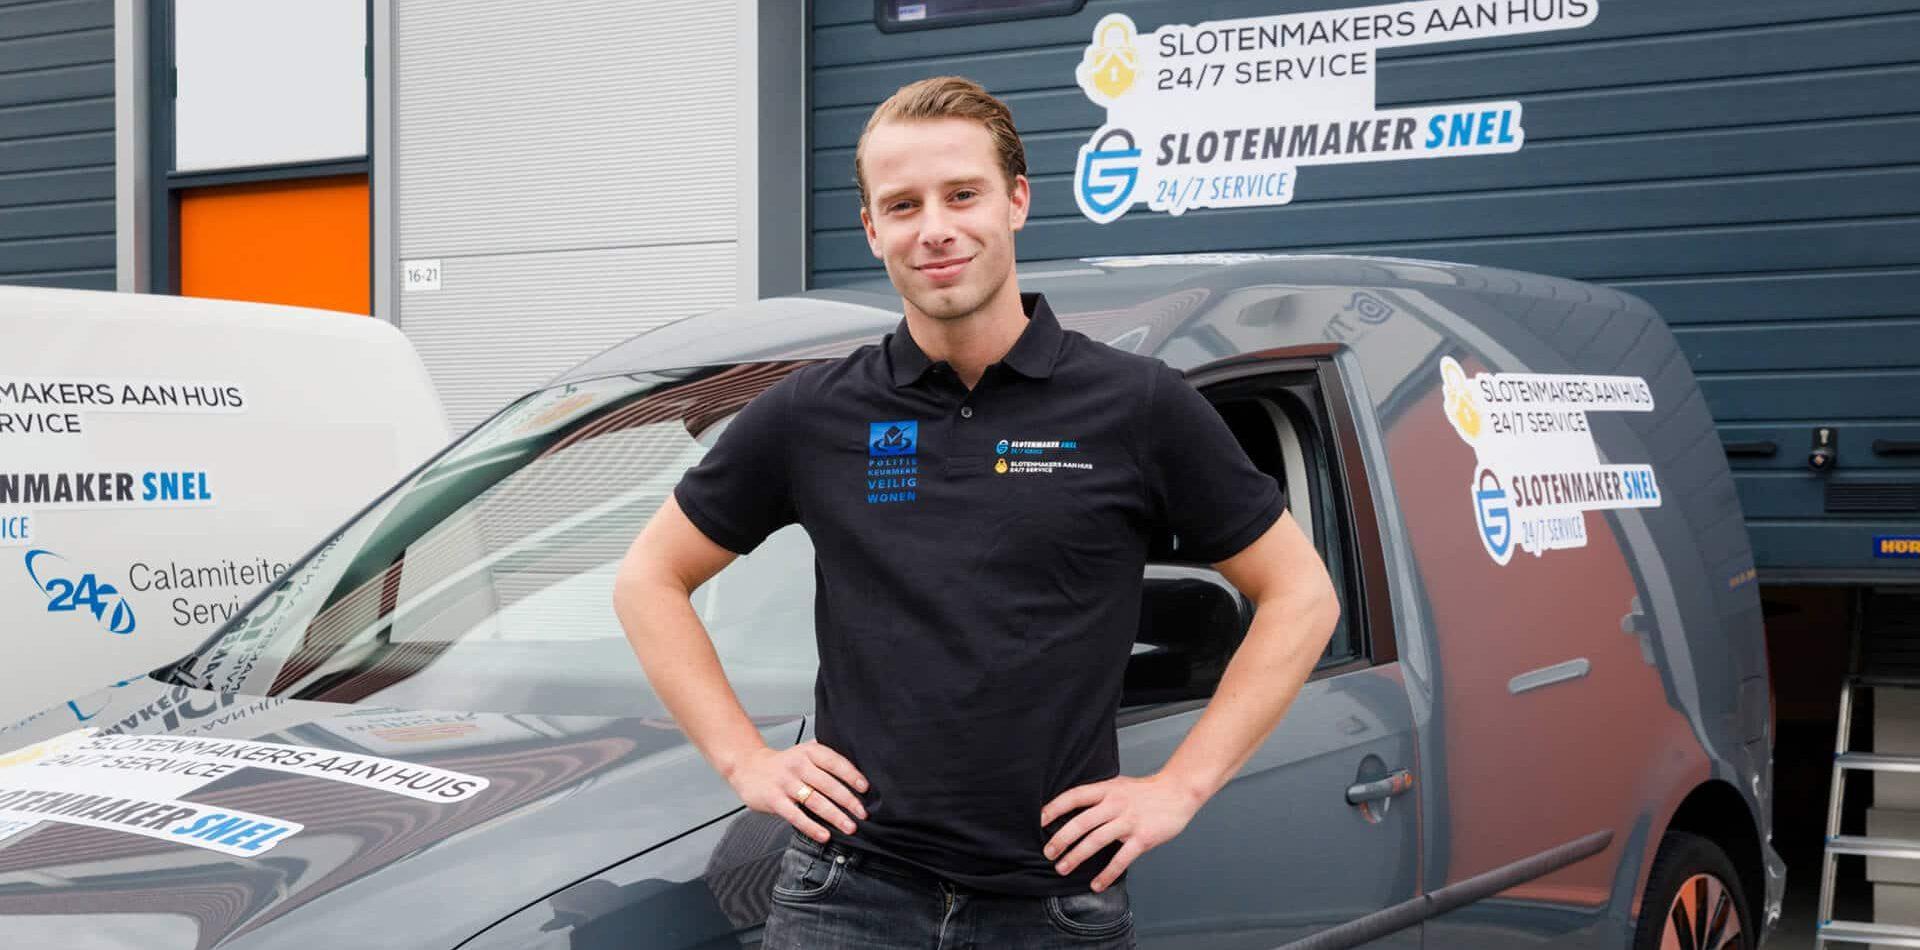 Slotenmaker Wateringen